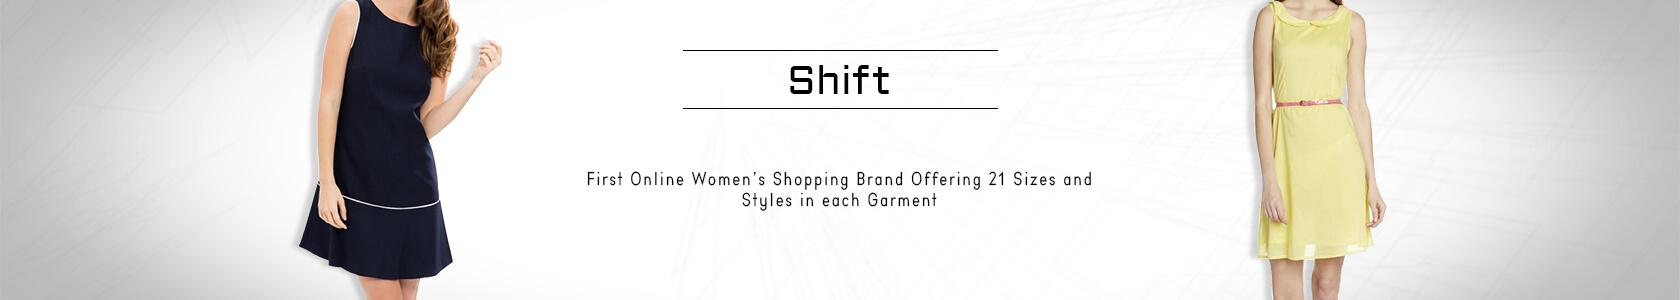 Shift